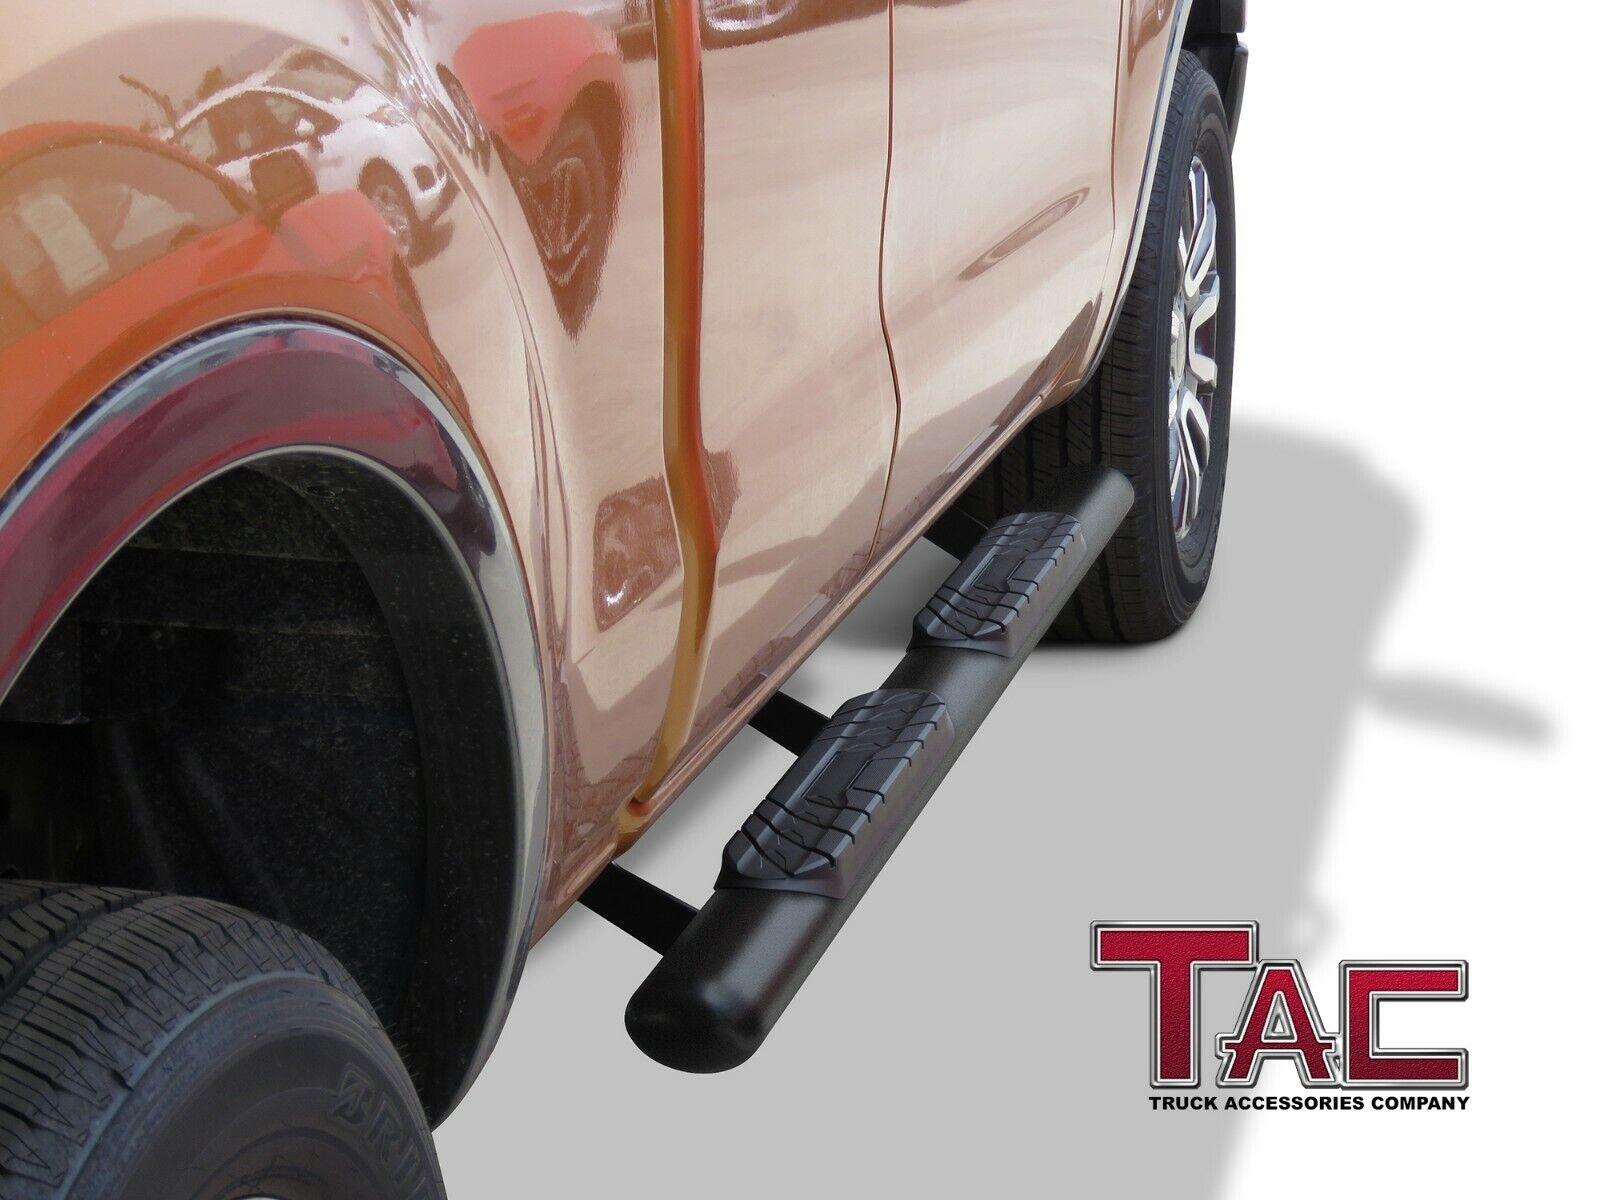 "TAC Side Steps Running Boards Fit 2019-2020 Ford Ranger Super Cab Truck Pickup 3/"" Texture Black Side Bars Nerf Bars Off Road Accessories"